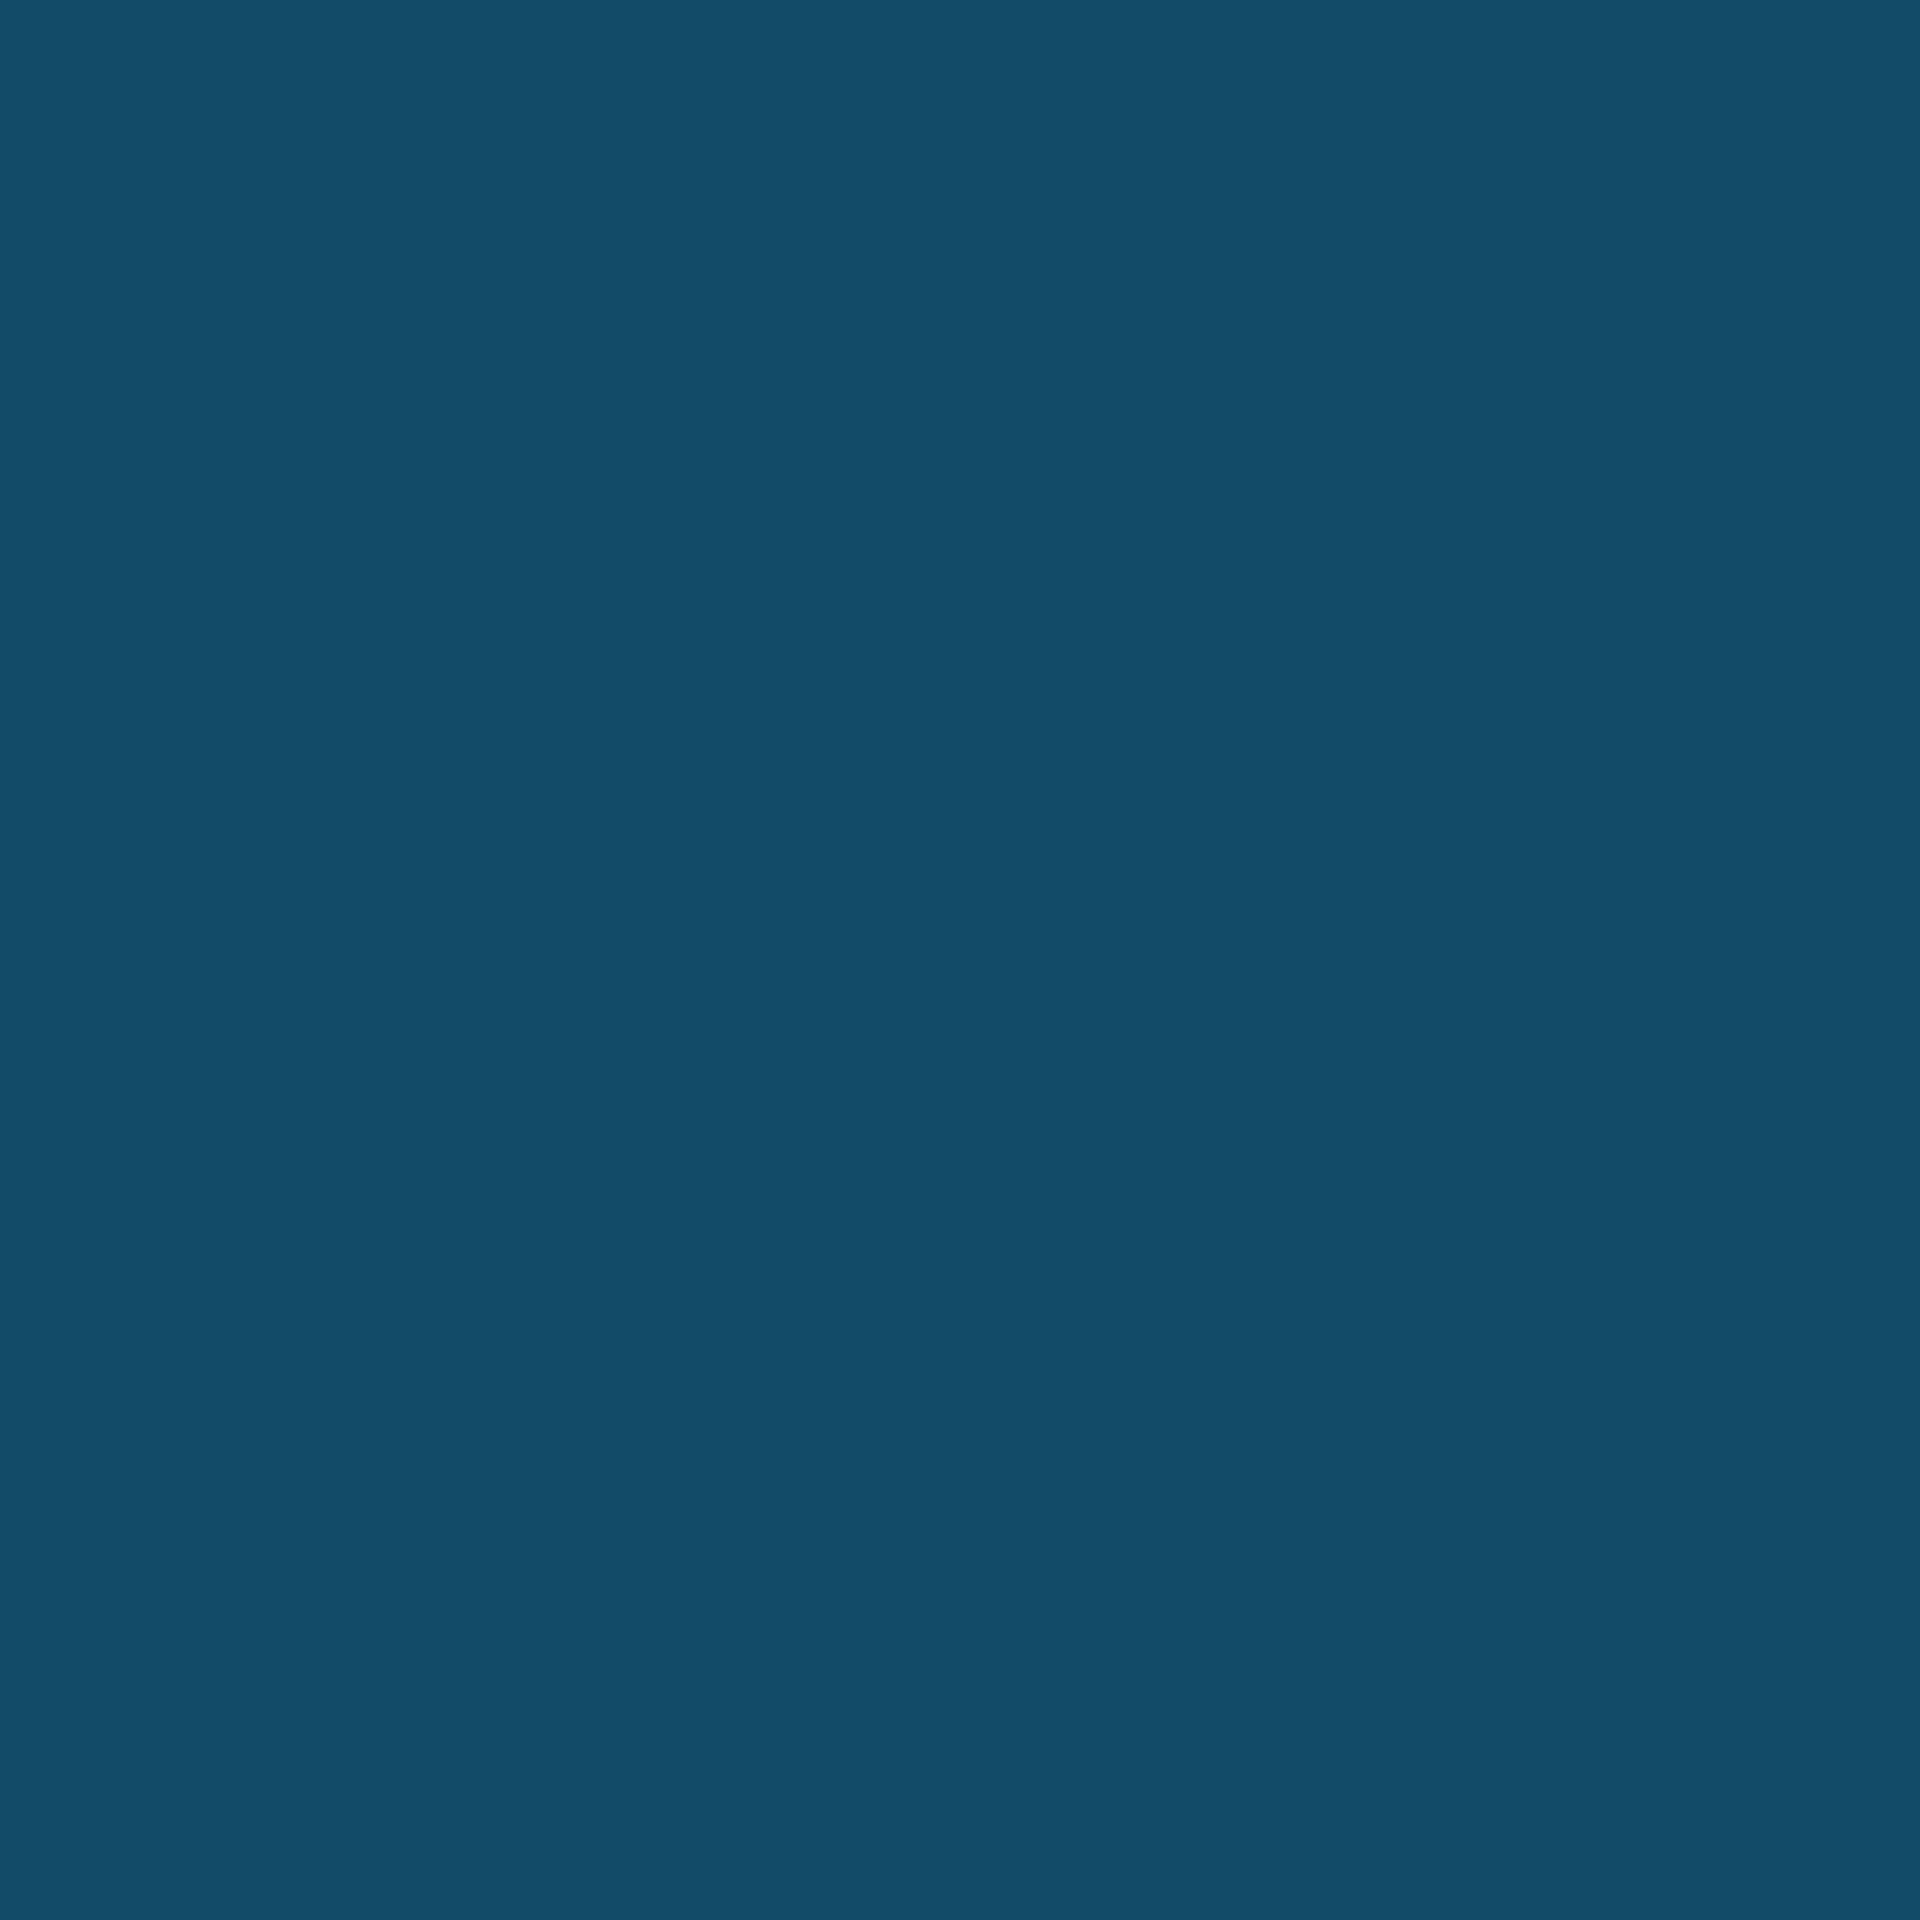 Zelenomodrá RAL 5001